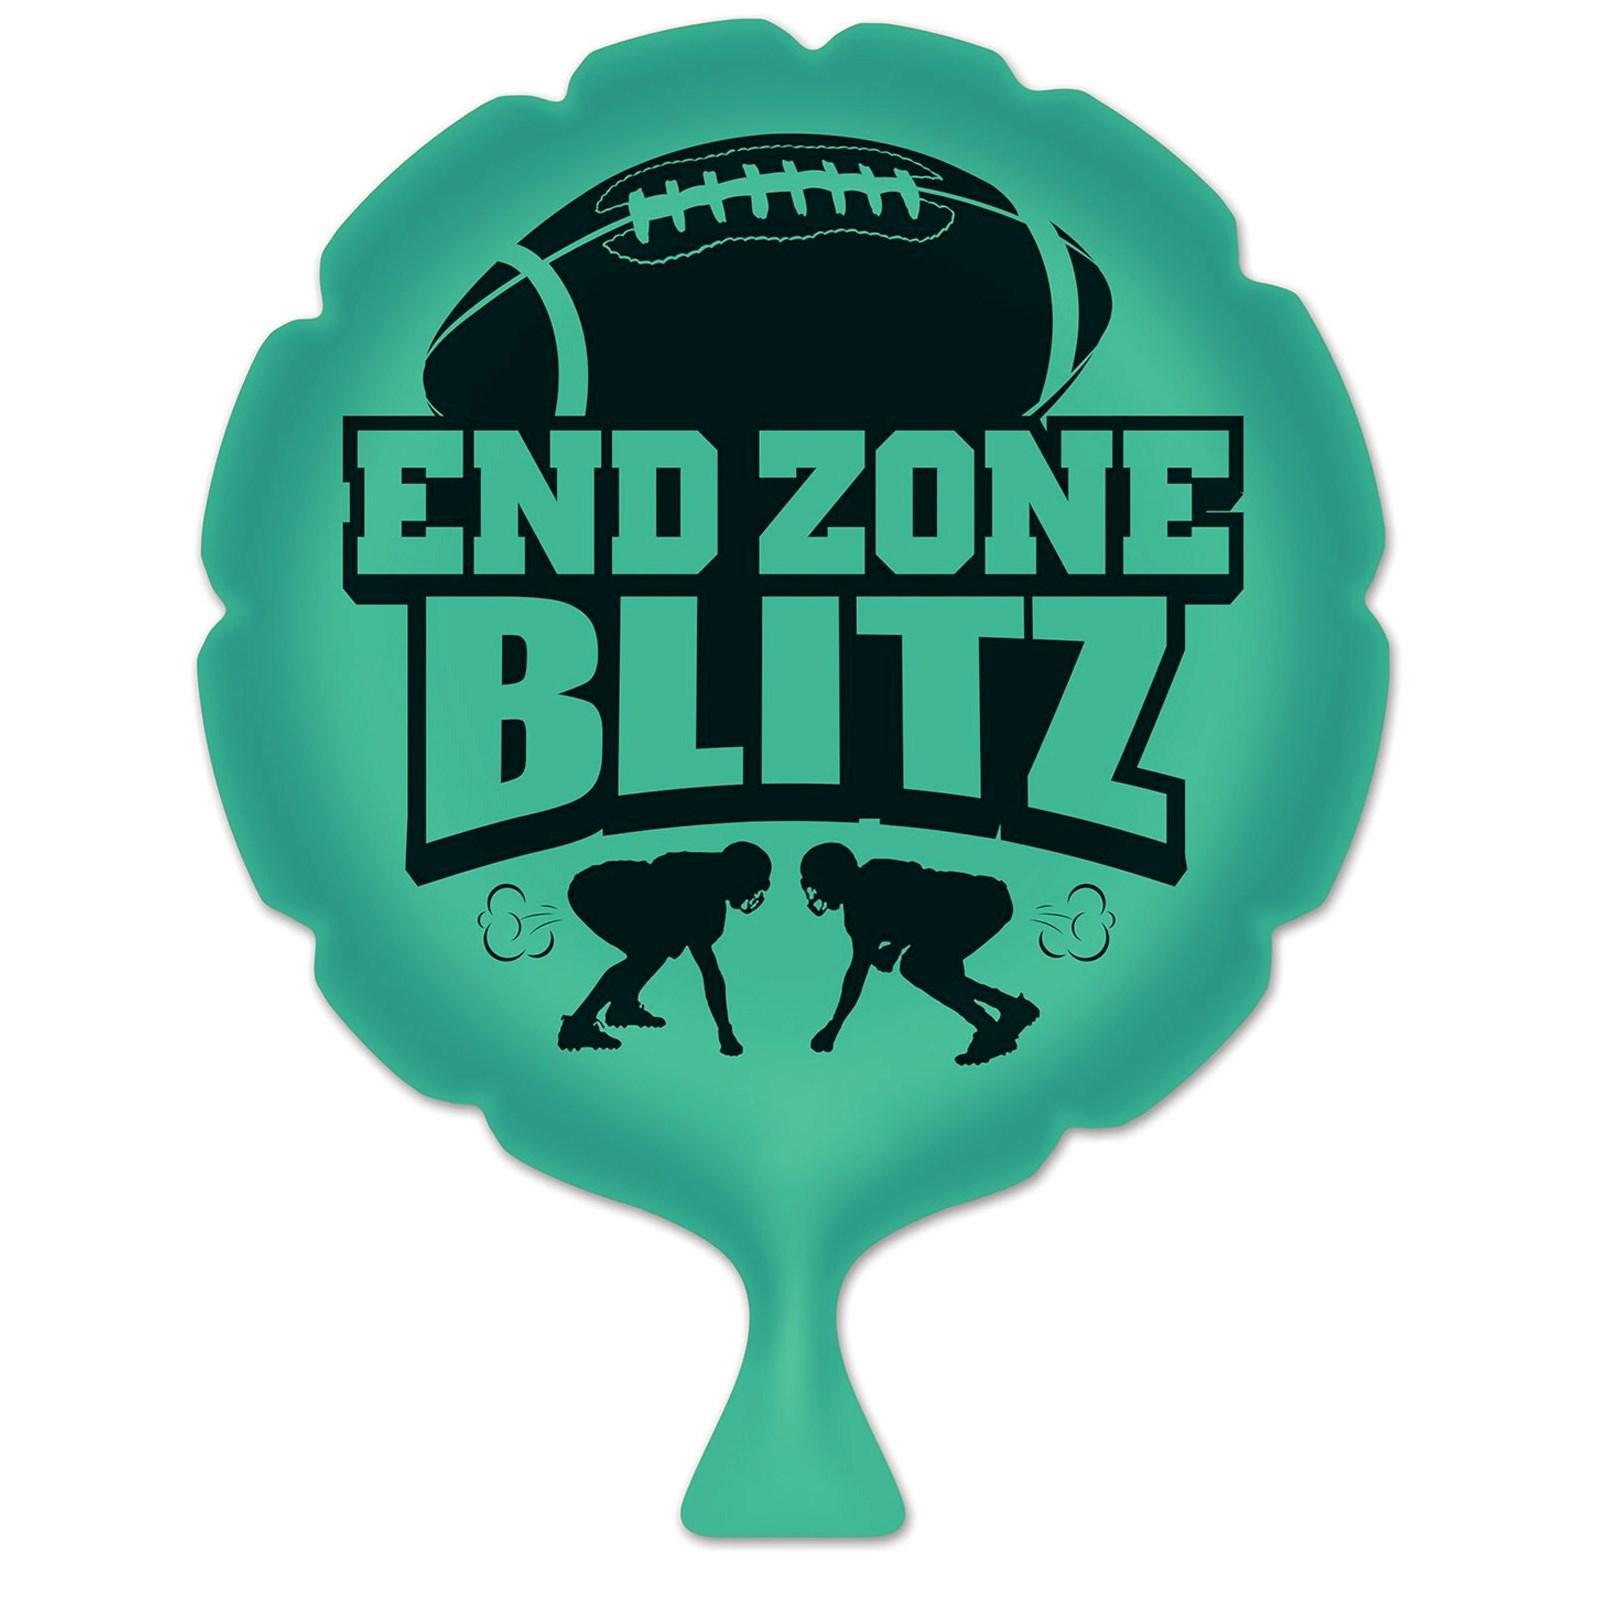 End Zone Blitz Whoopee Cushion